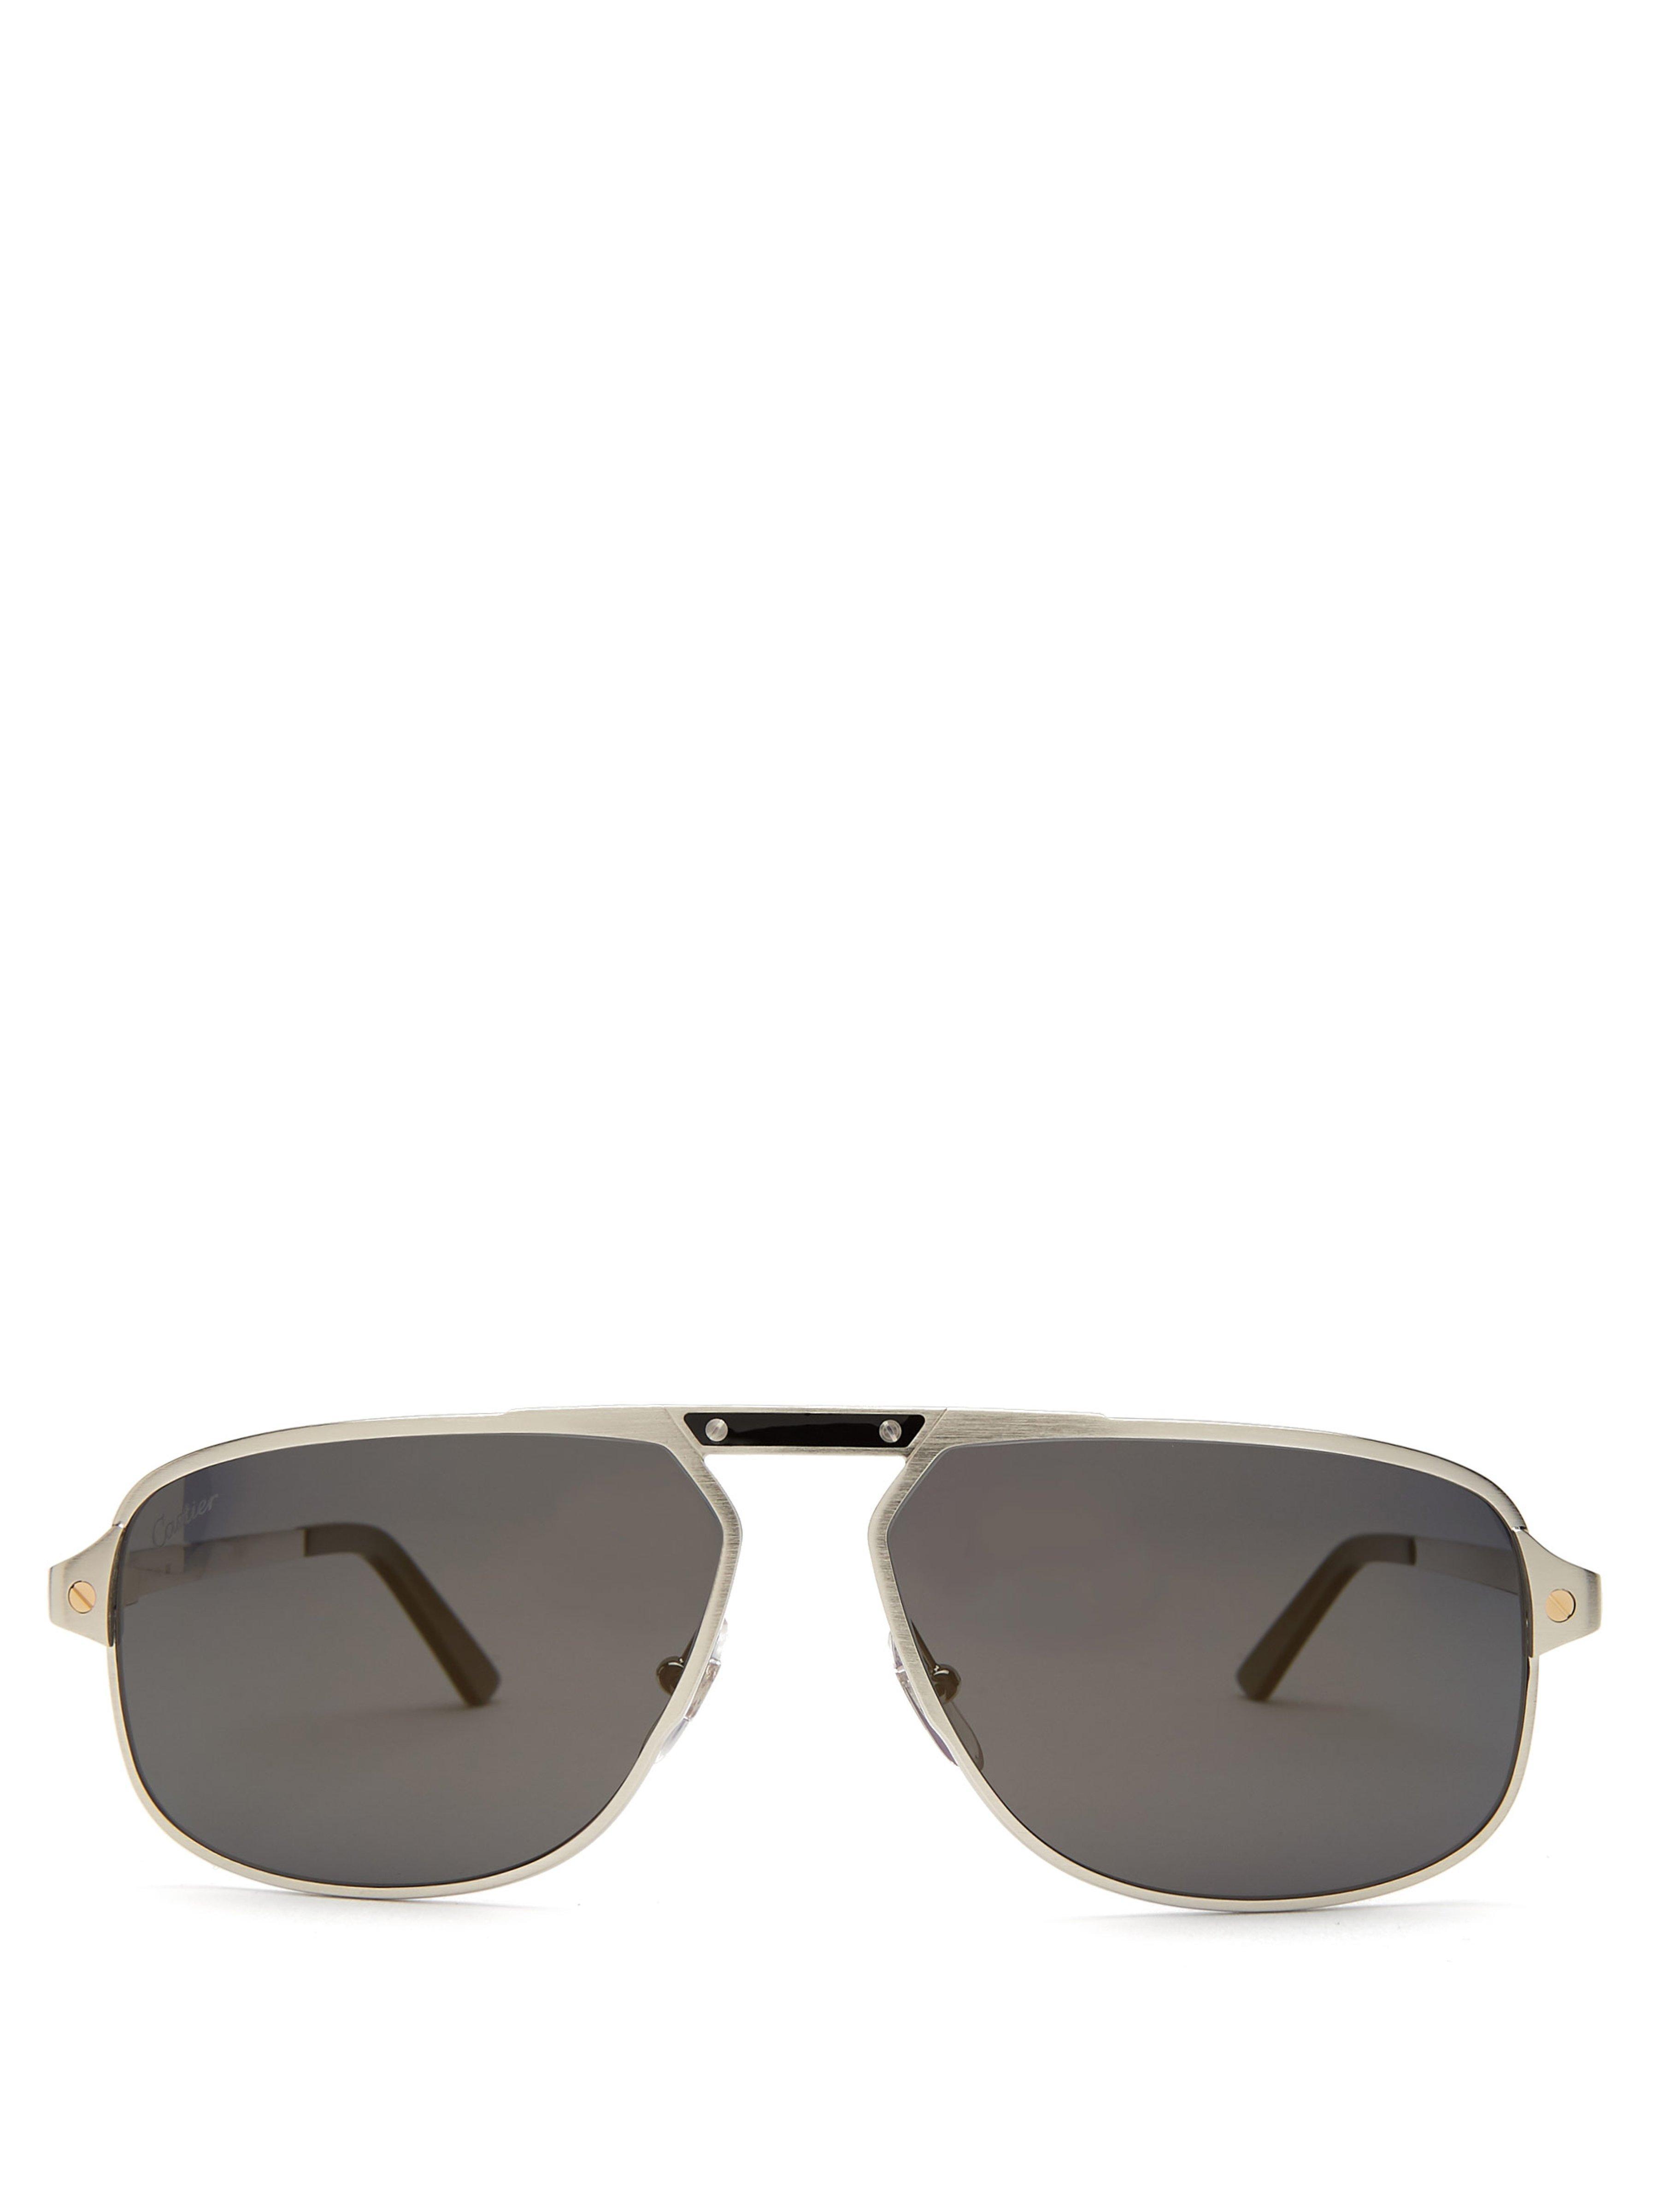 24768fd42d042 Cartier Santos De Cartier Aviator Sunglasses for Men - Lyst